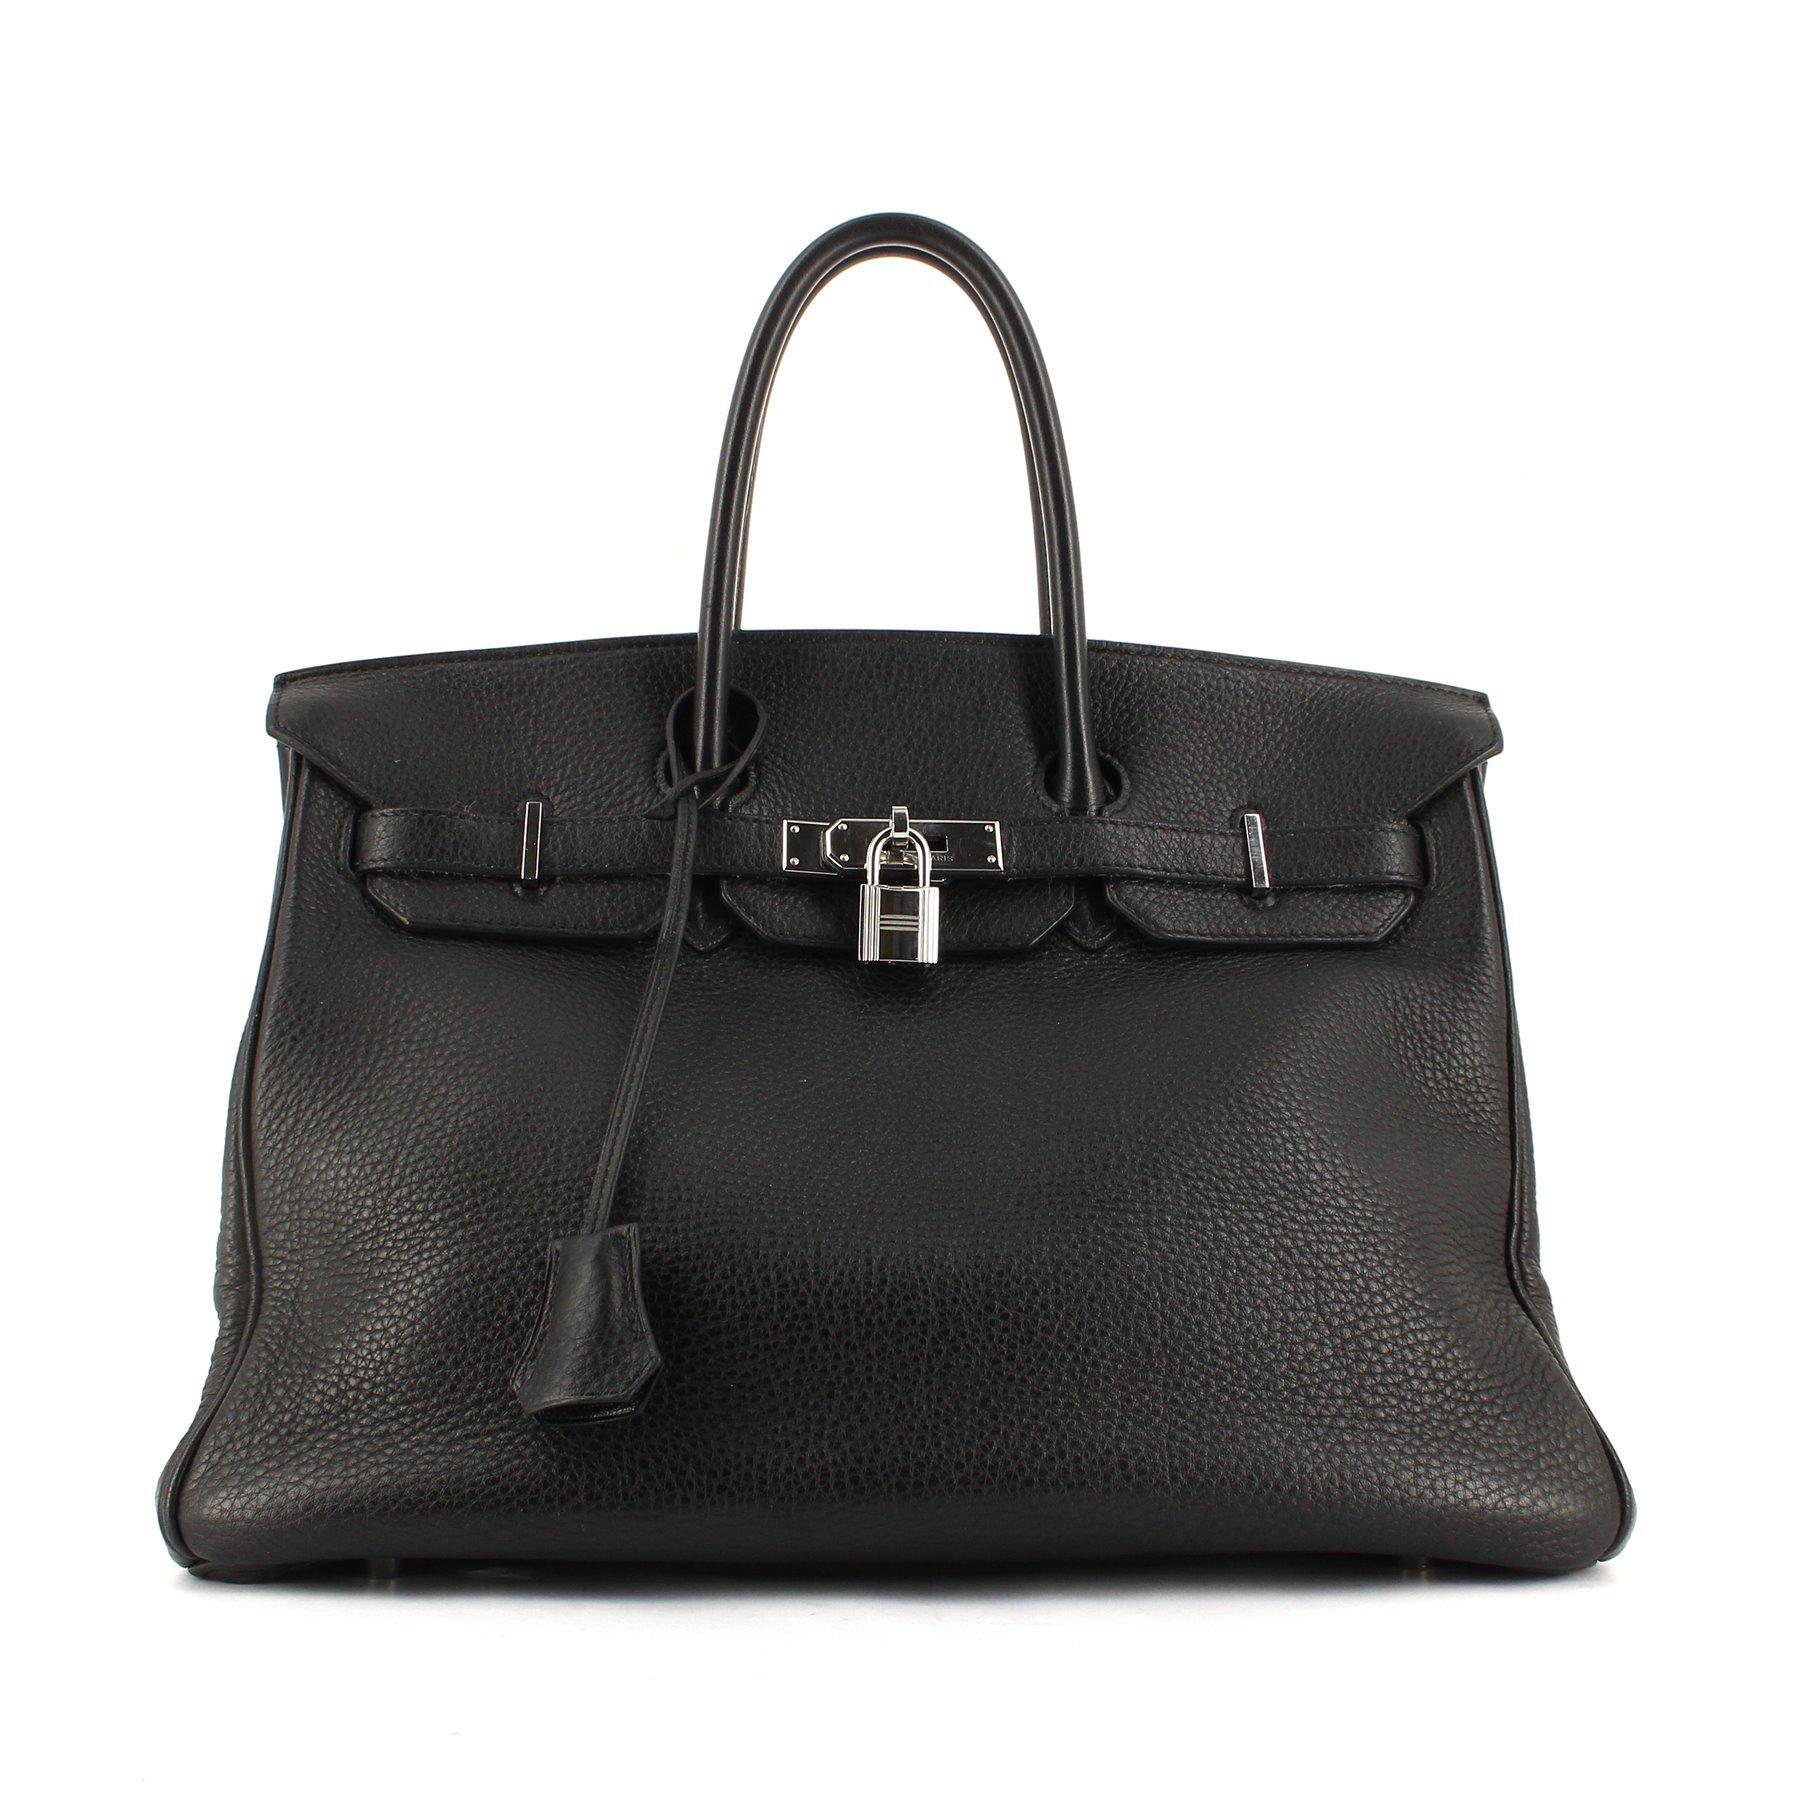 d6ffbb5c69 ... éternel intemporel Un sac, un look : le Birkin d'Hermès, éternel  intemporel ...